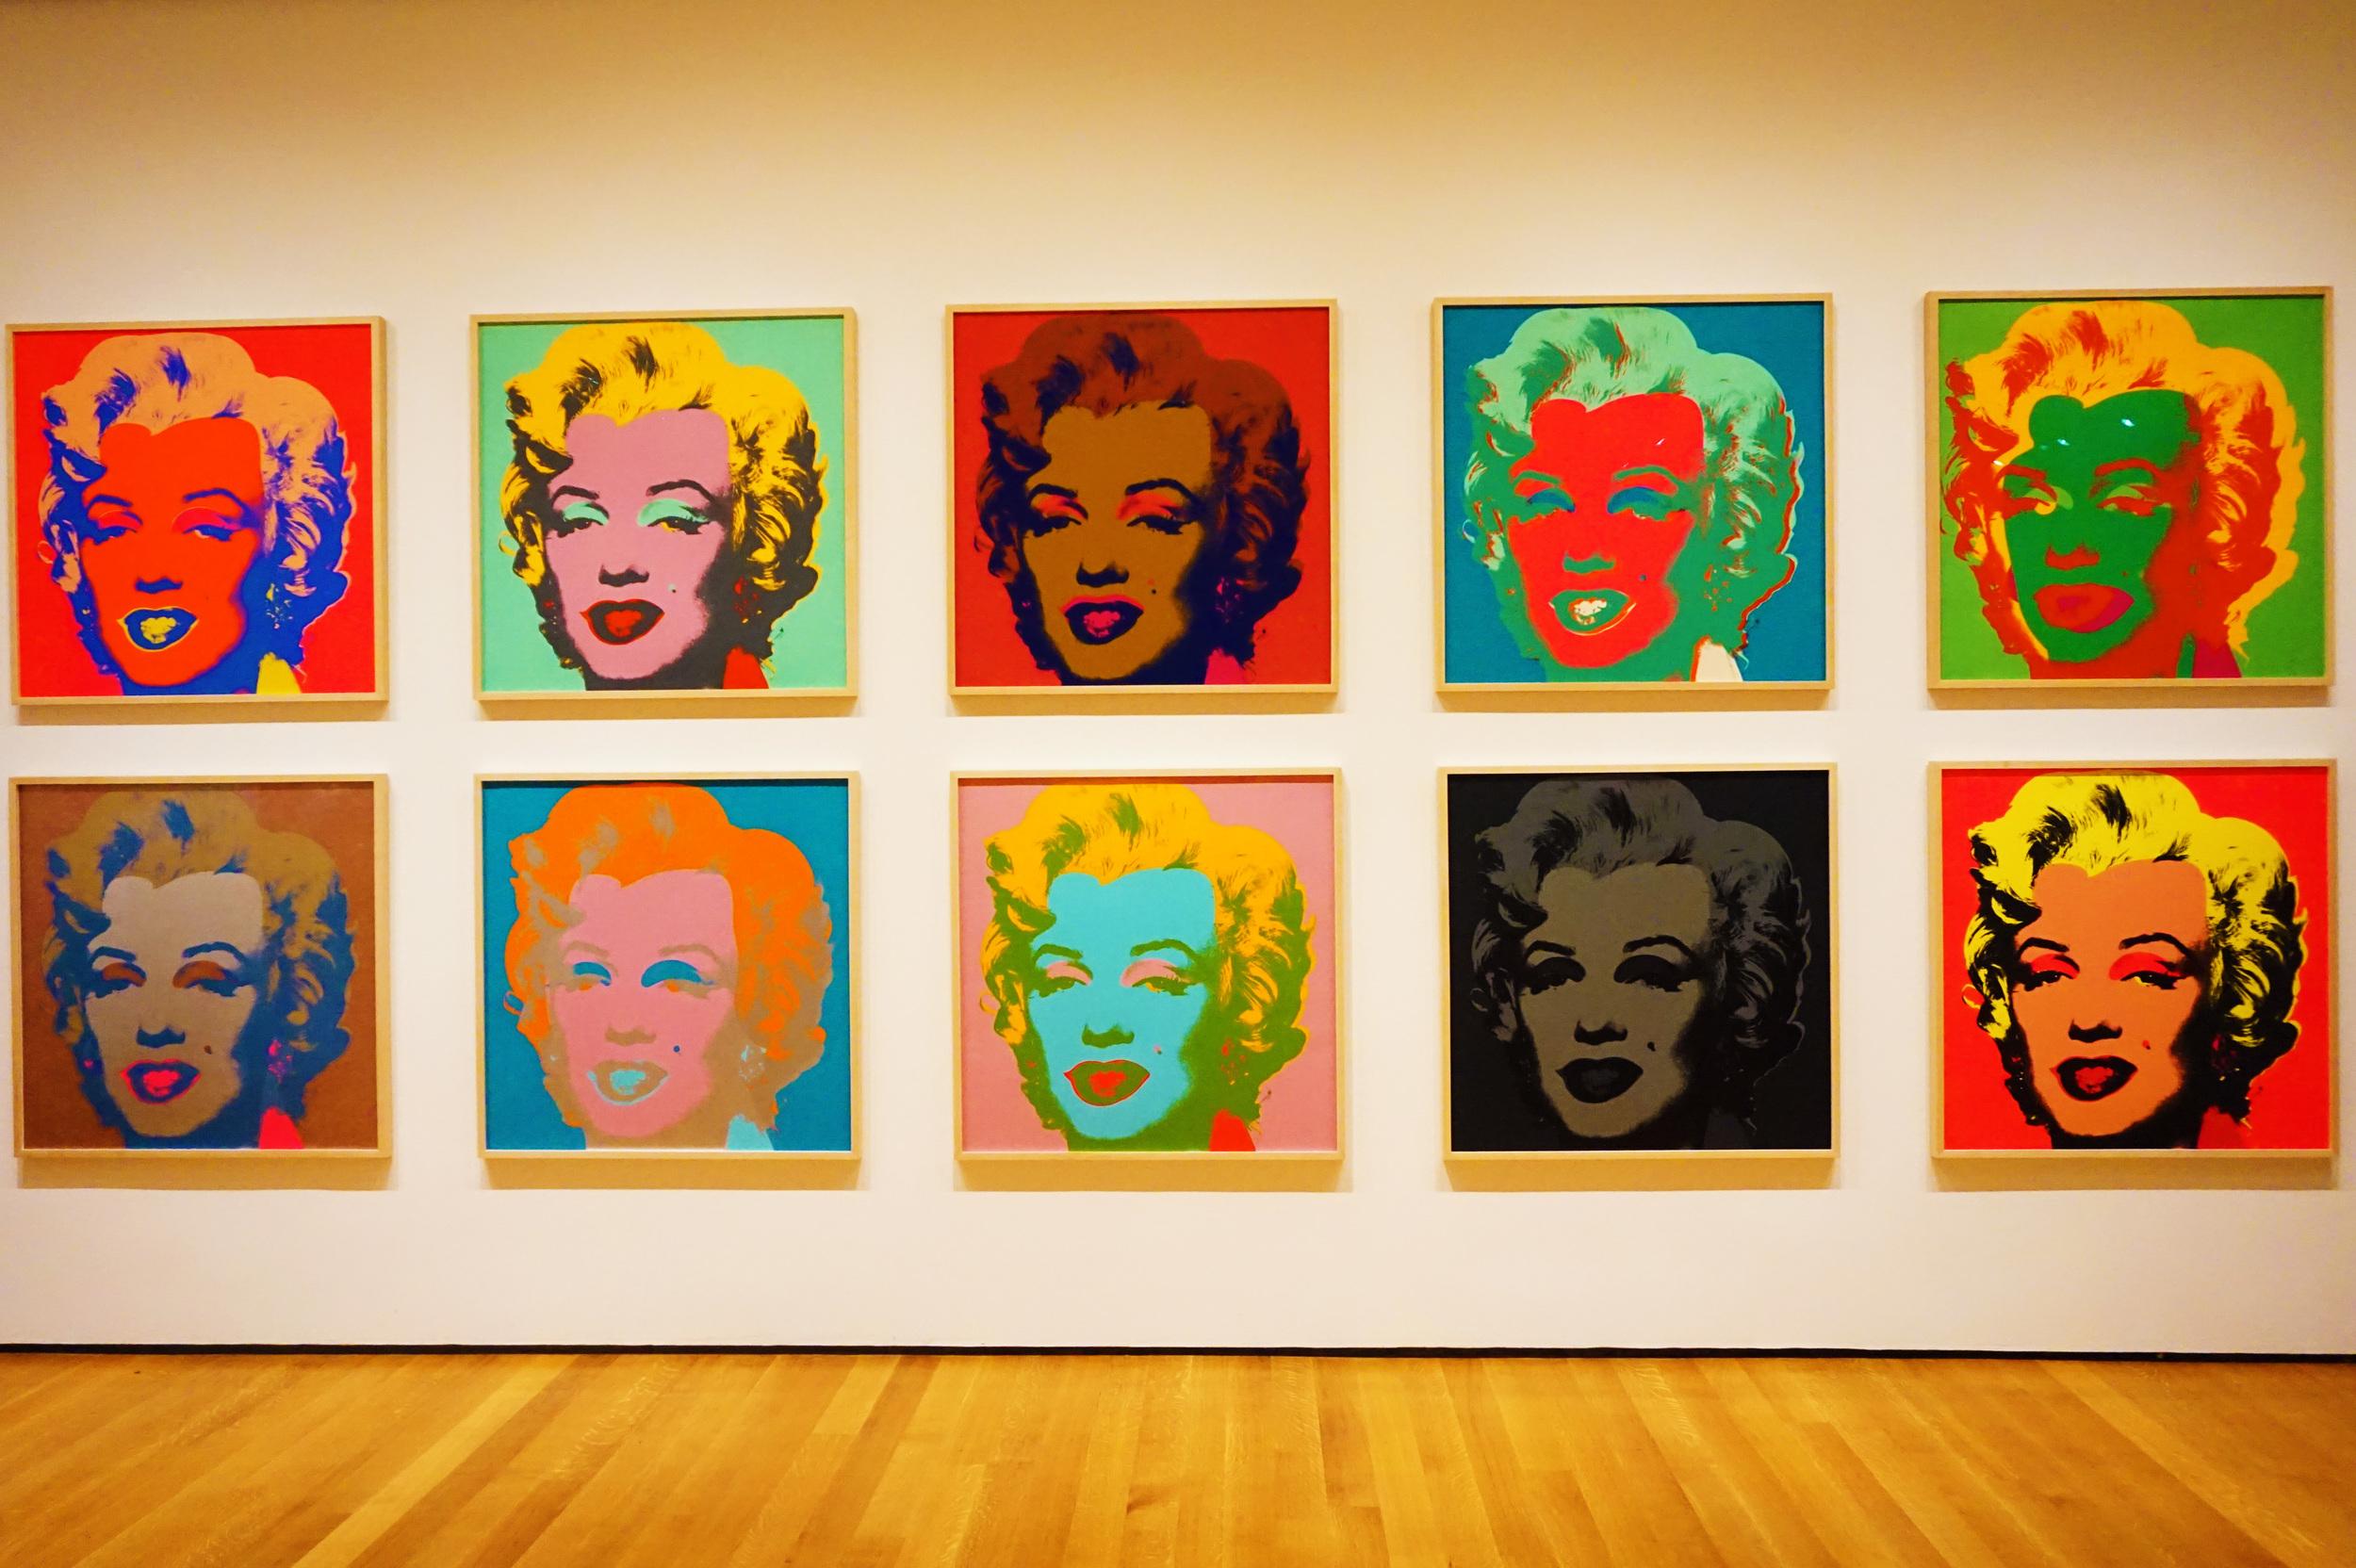 Andy Warhol's Marilyn Monroe pritns